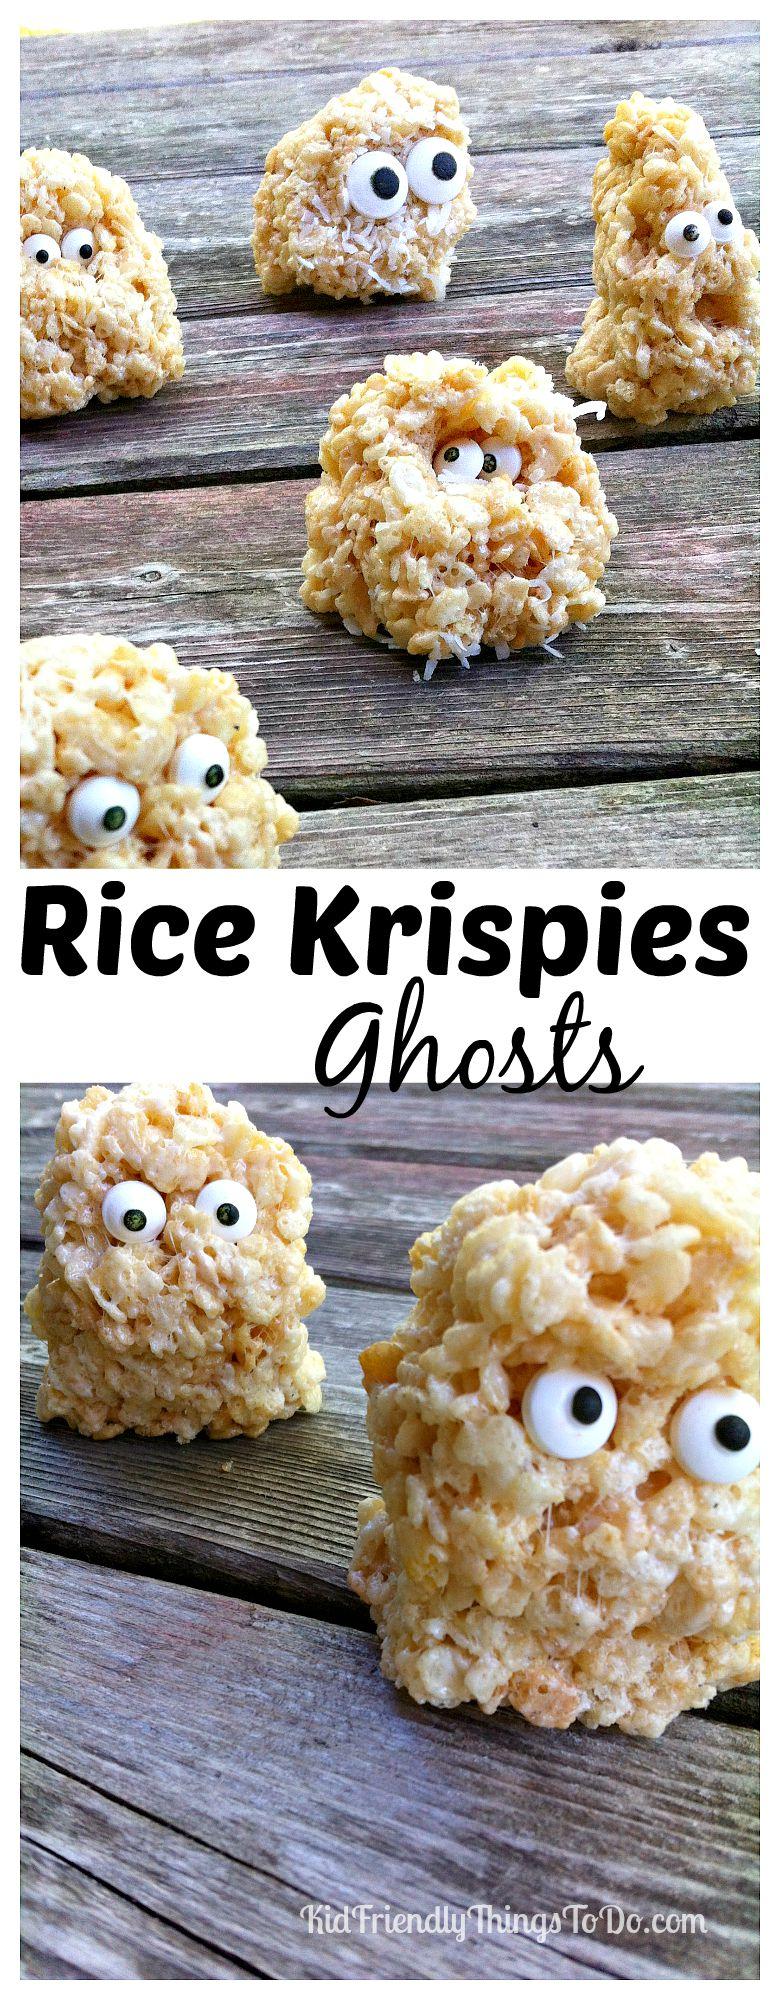 Rice Krispies Treats Ghosts - A Halloween or Hotel Transylvania Fun Food - KidFriendlyThingsToDo.com